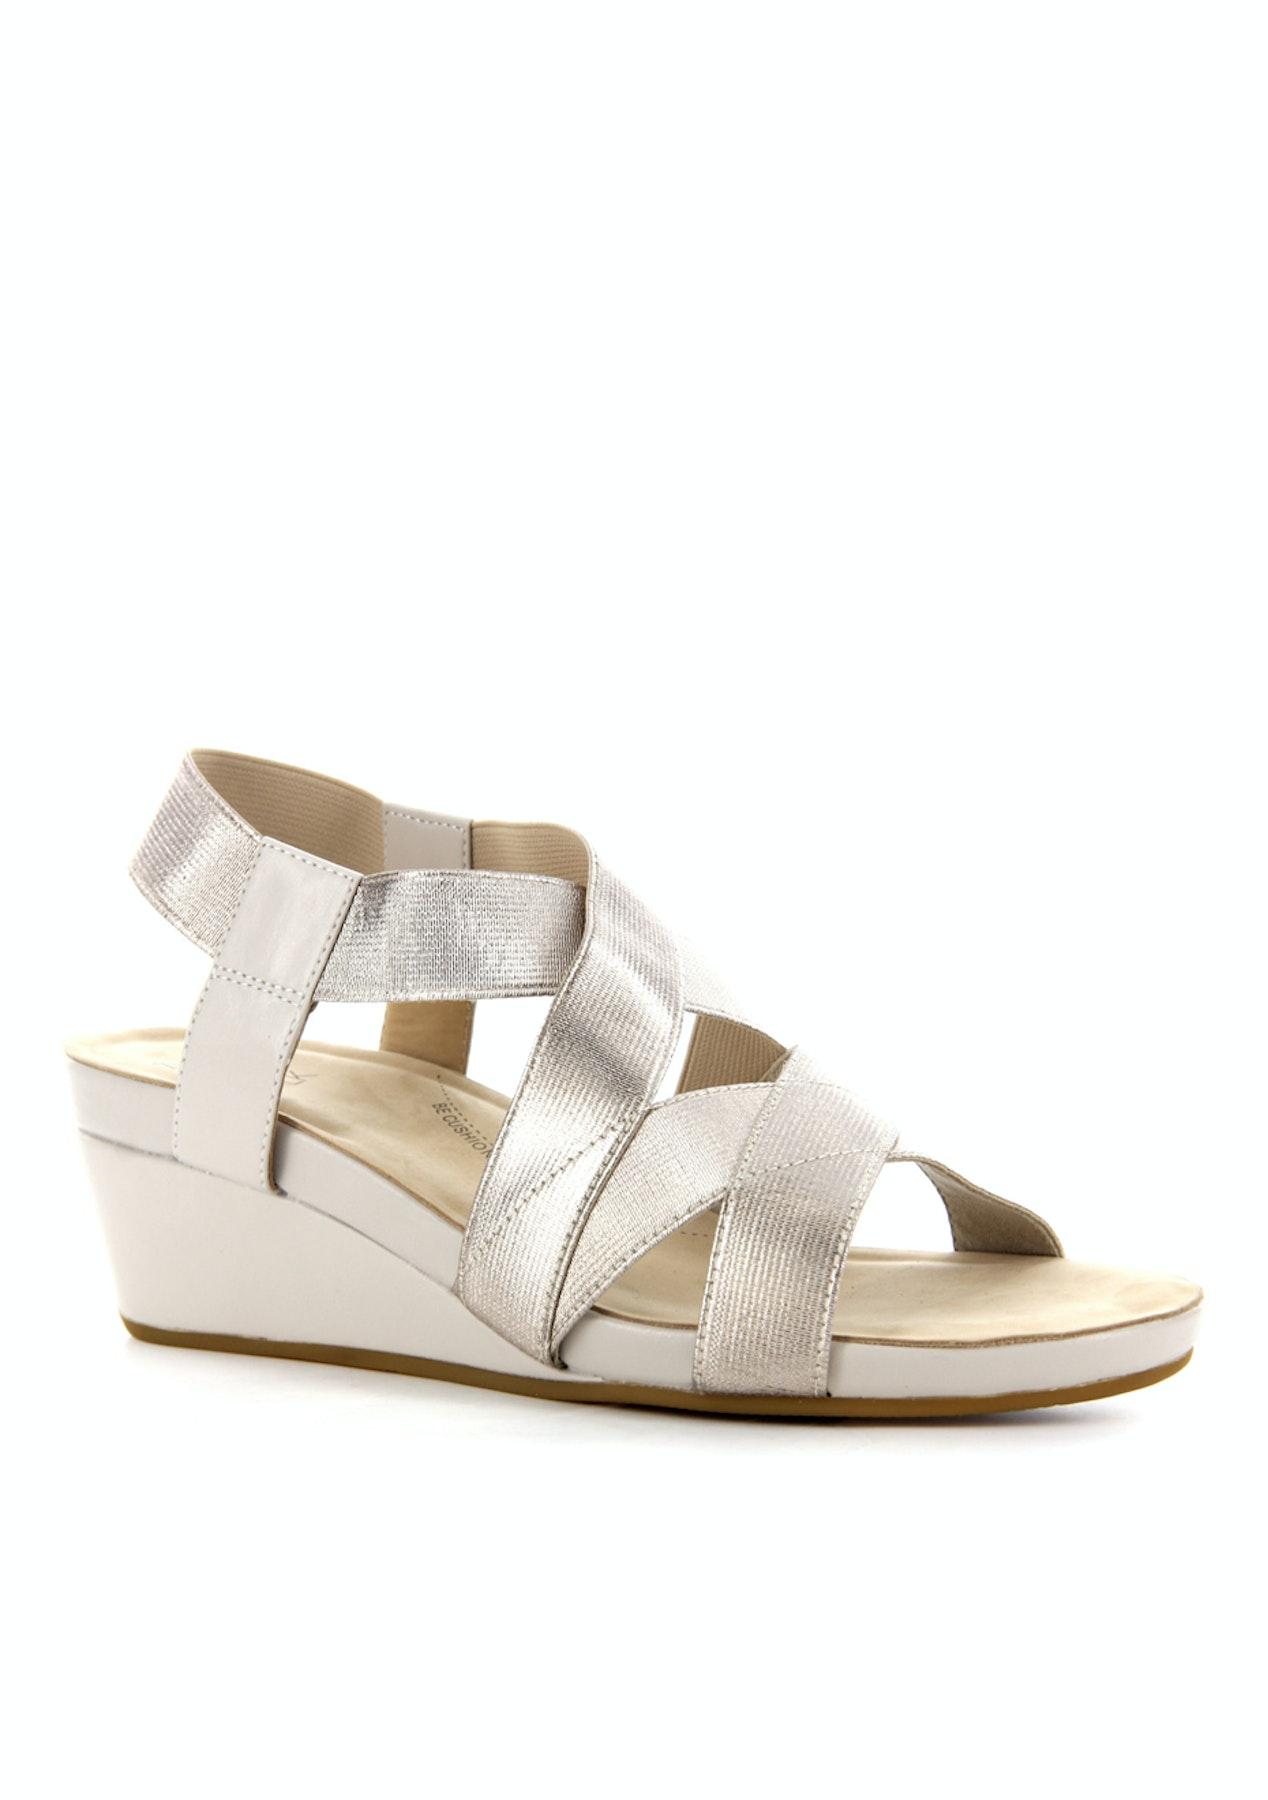 dd75ea7da87 Ziera - Ulmer - Rosegold - Wide - Shoes Garage Sale - Onceit